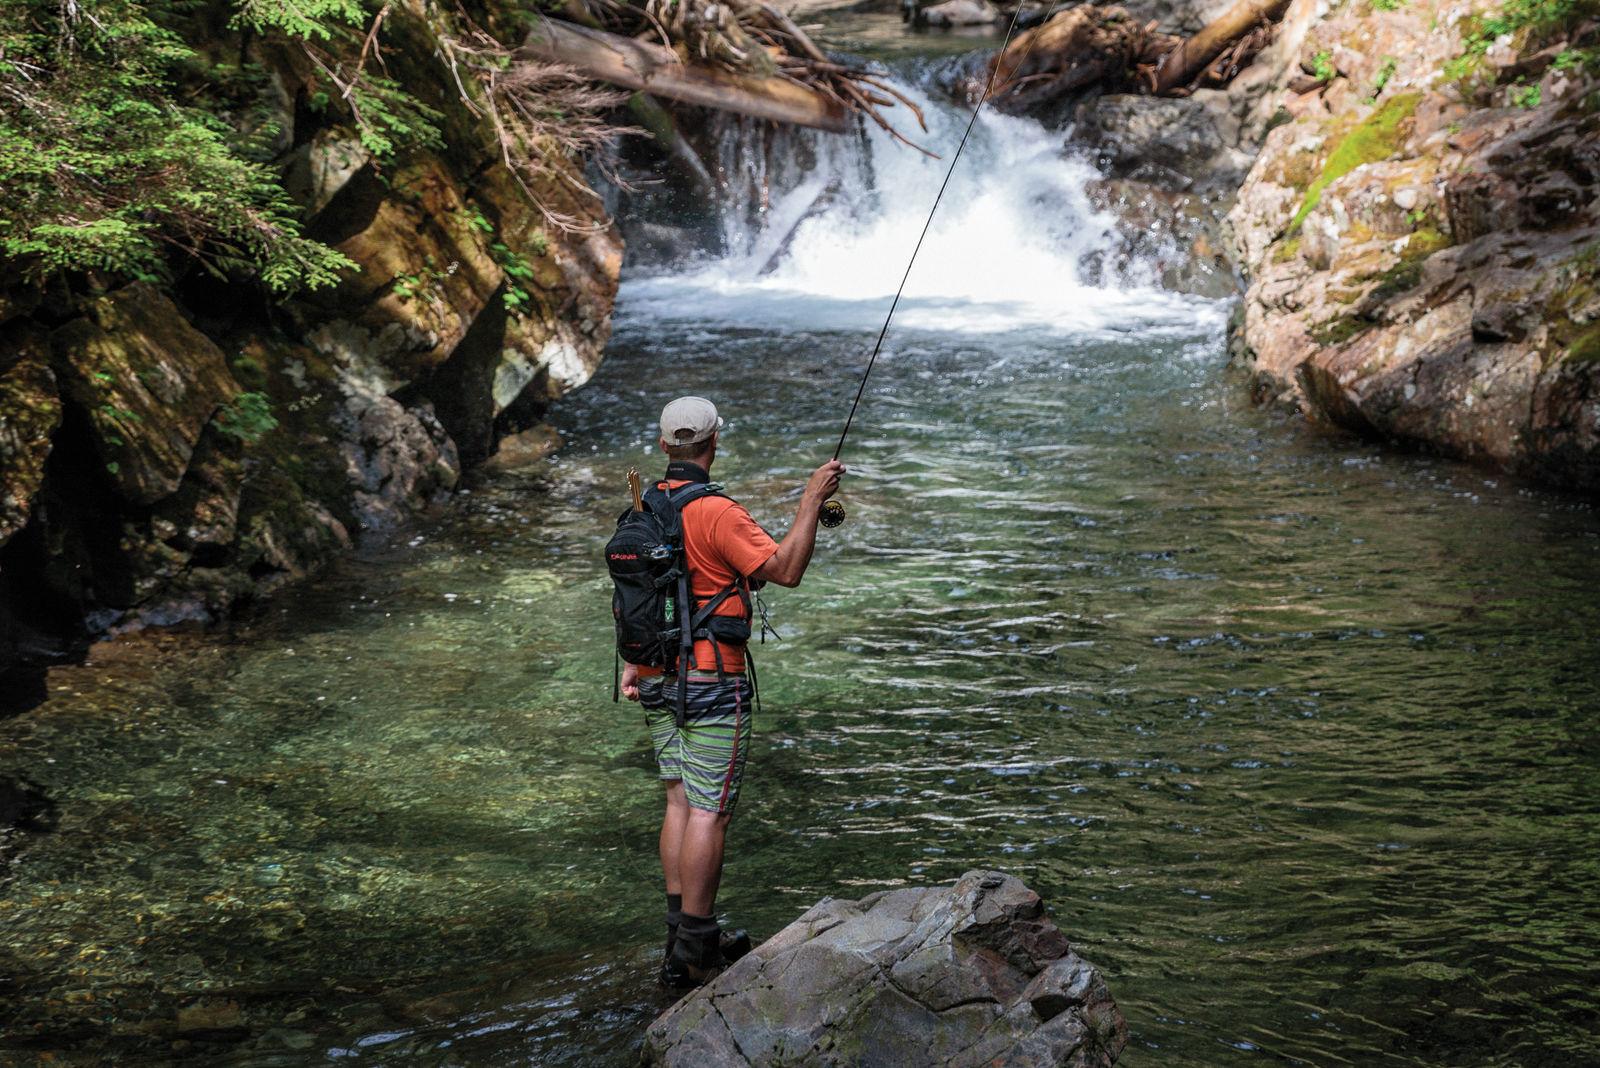 Daniel silverberg 2014 07 27 south fork snoqualmie denny creek 0256 edit eumj8j